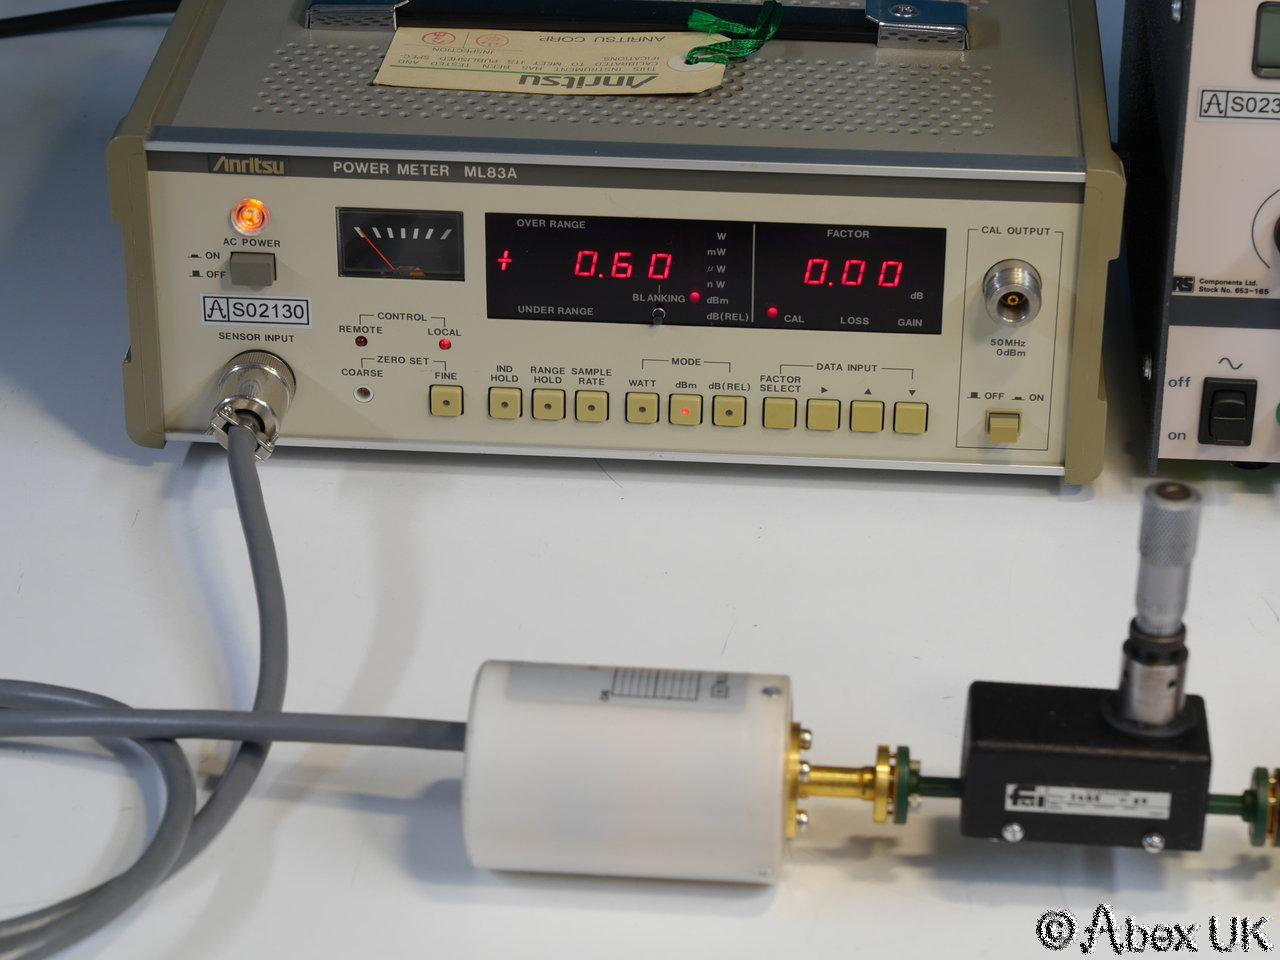 Rf Power Meter : Anritsu ml a rf power meter mint condition